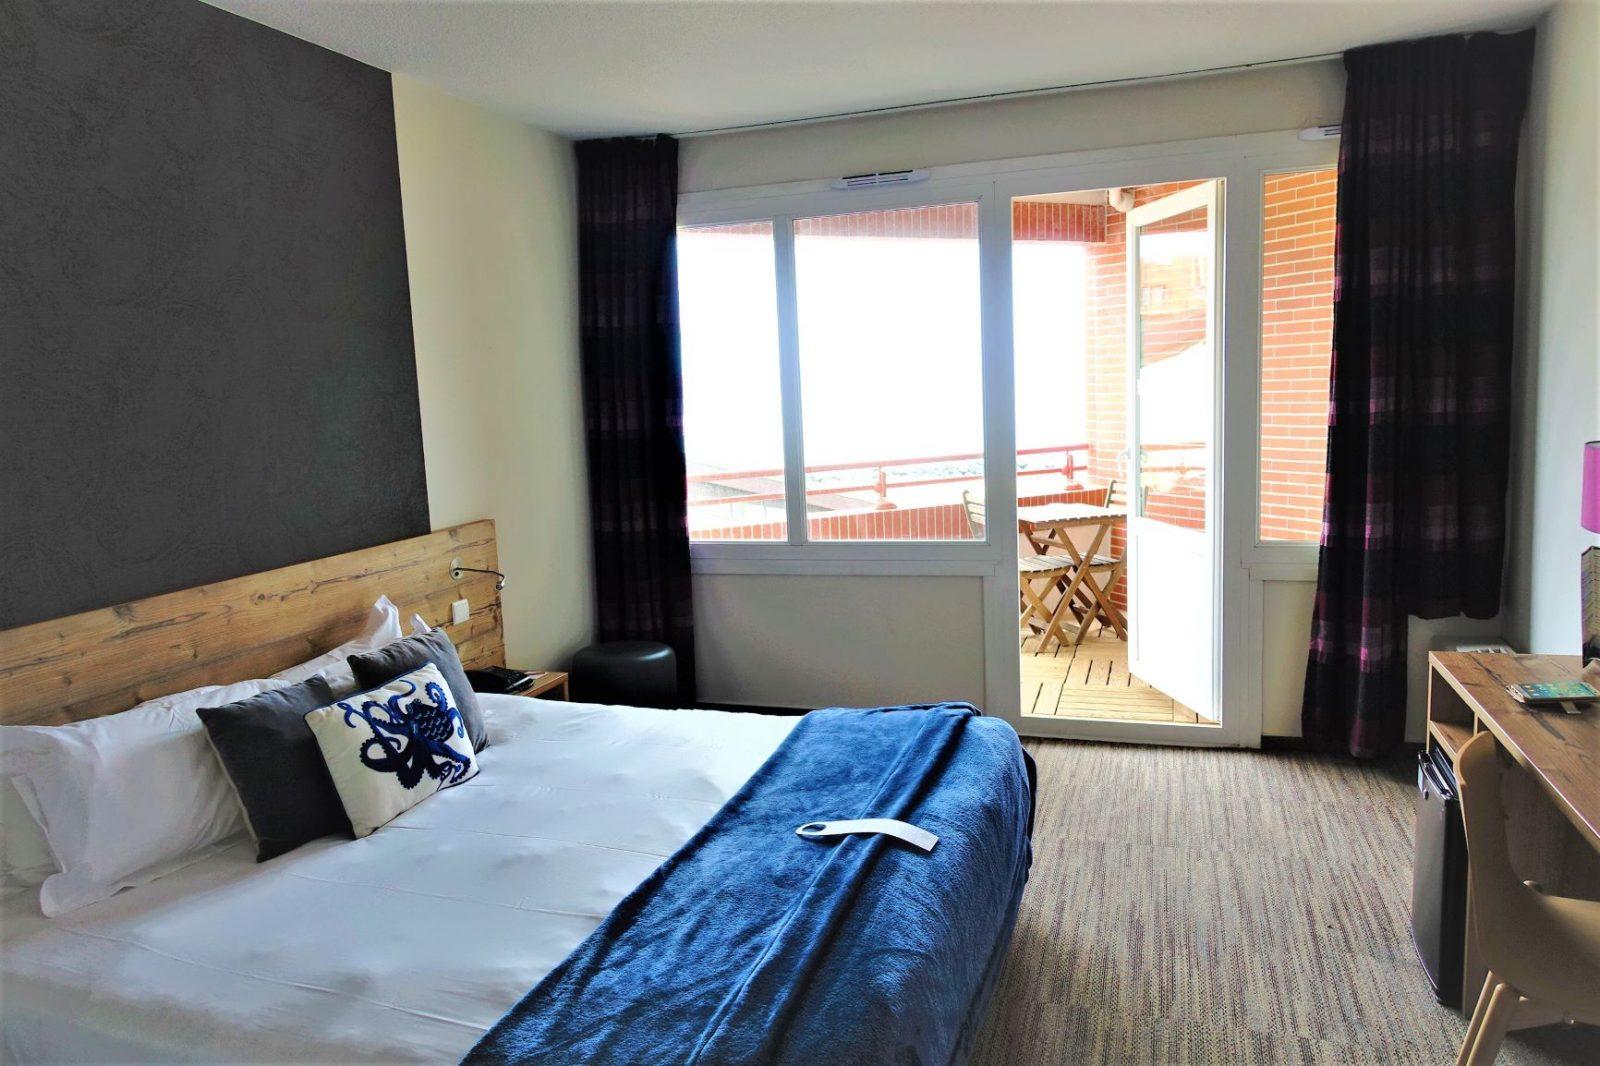 hotellrom østkysten frankrike